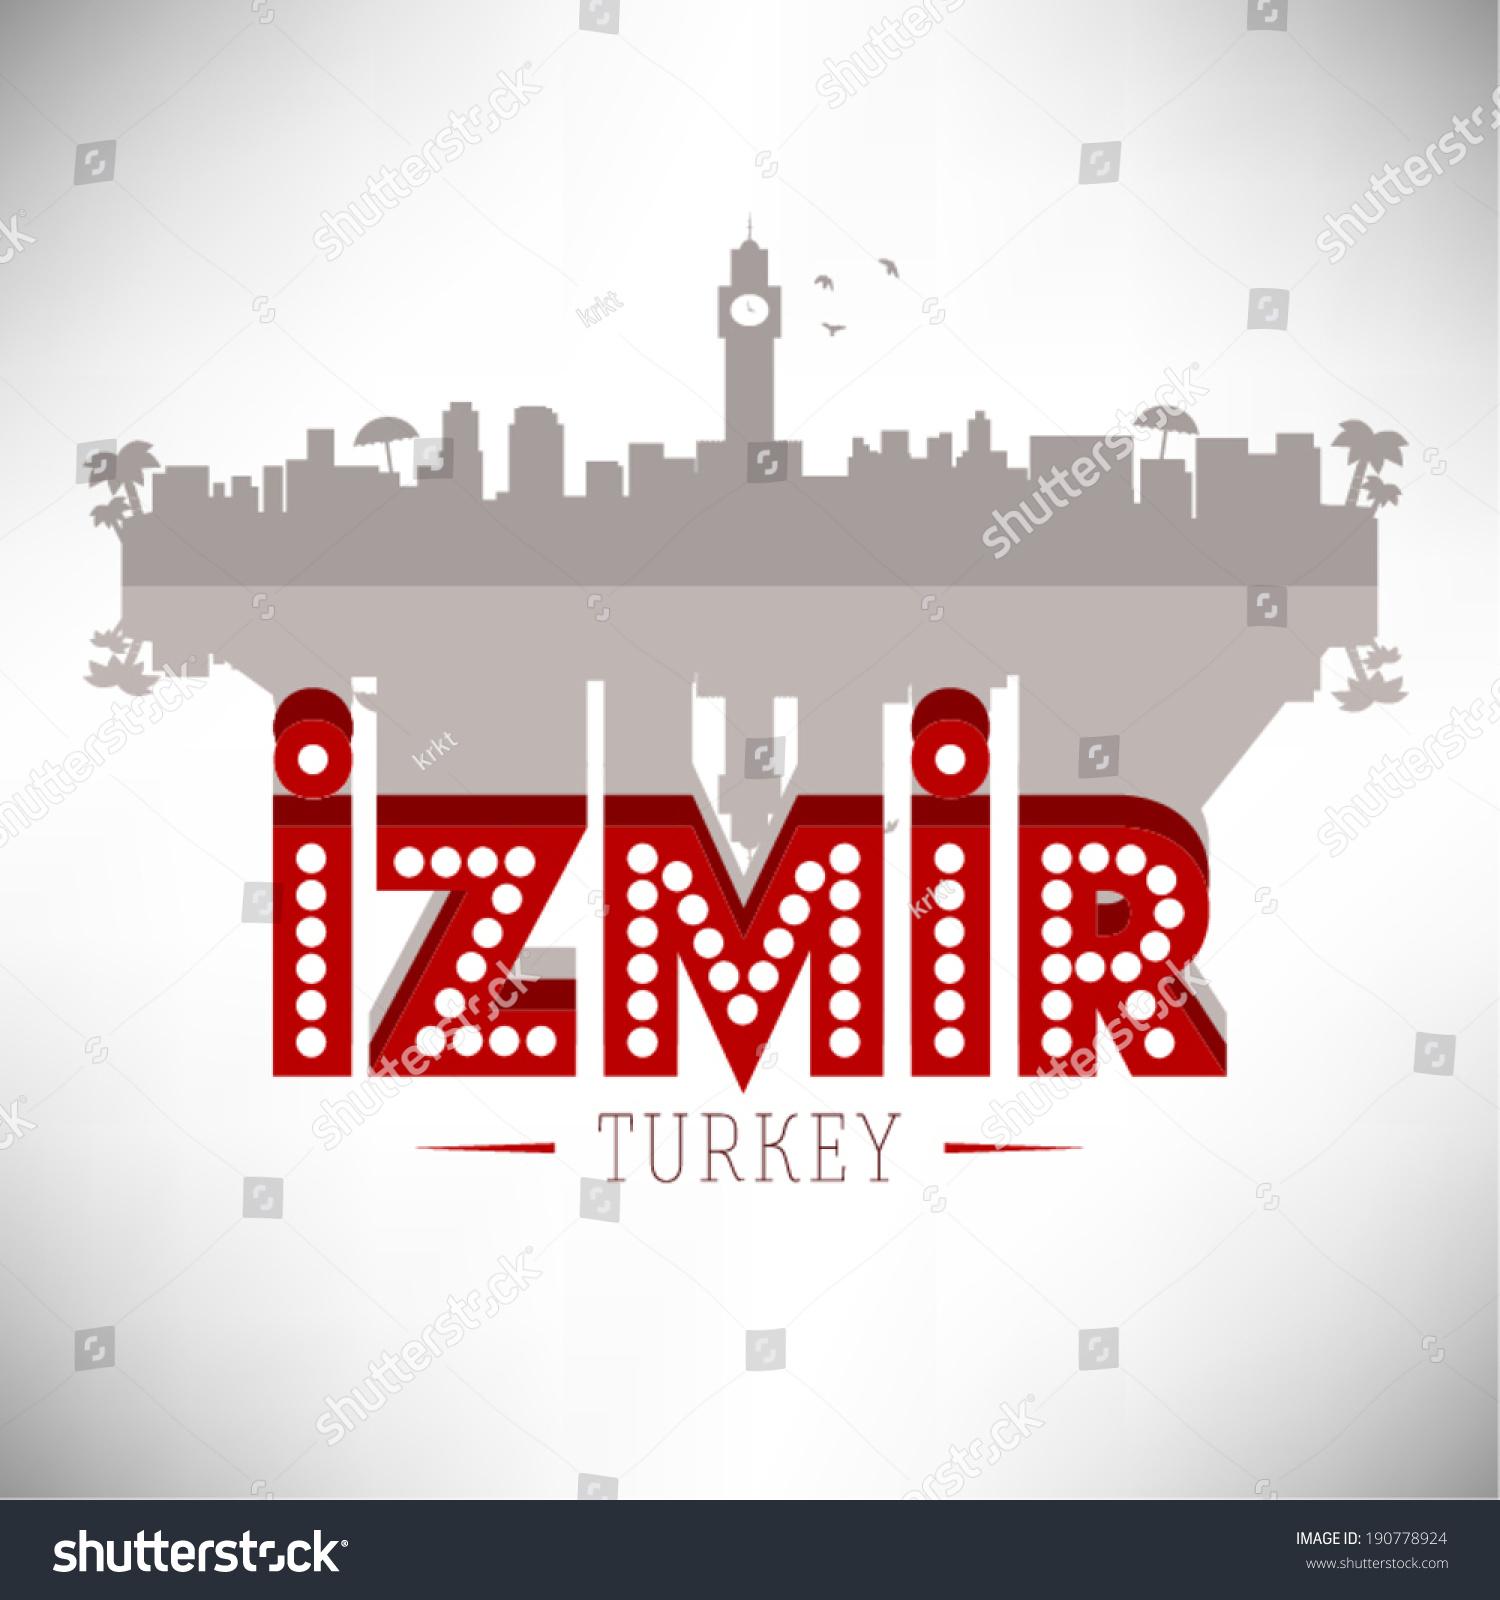 Izmir Turkey Skyline Design Vector Illustration Stock Vector Royalty Free 190778924